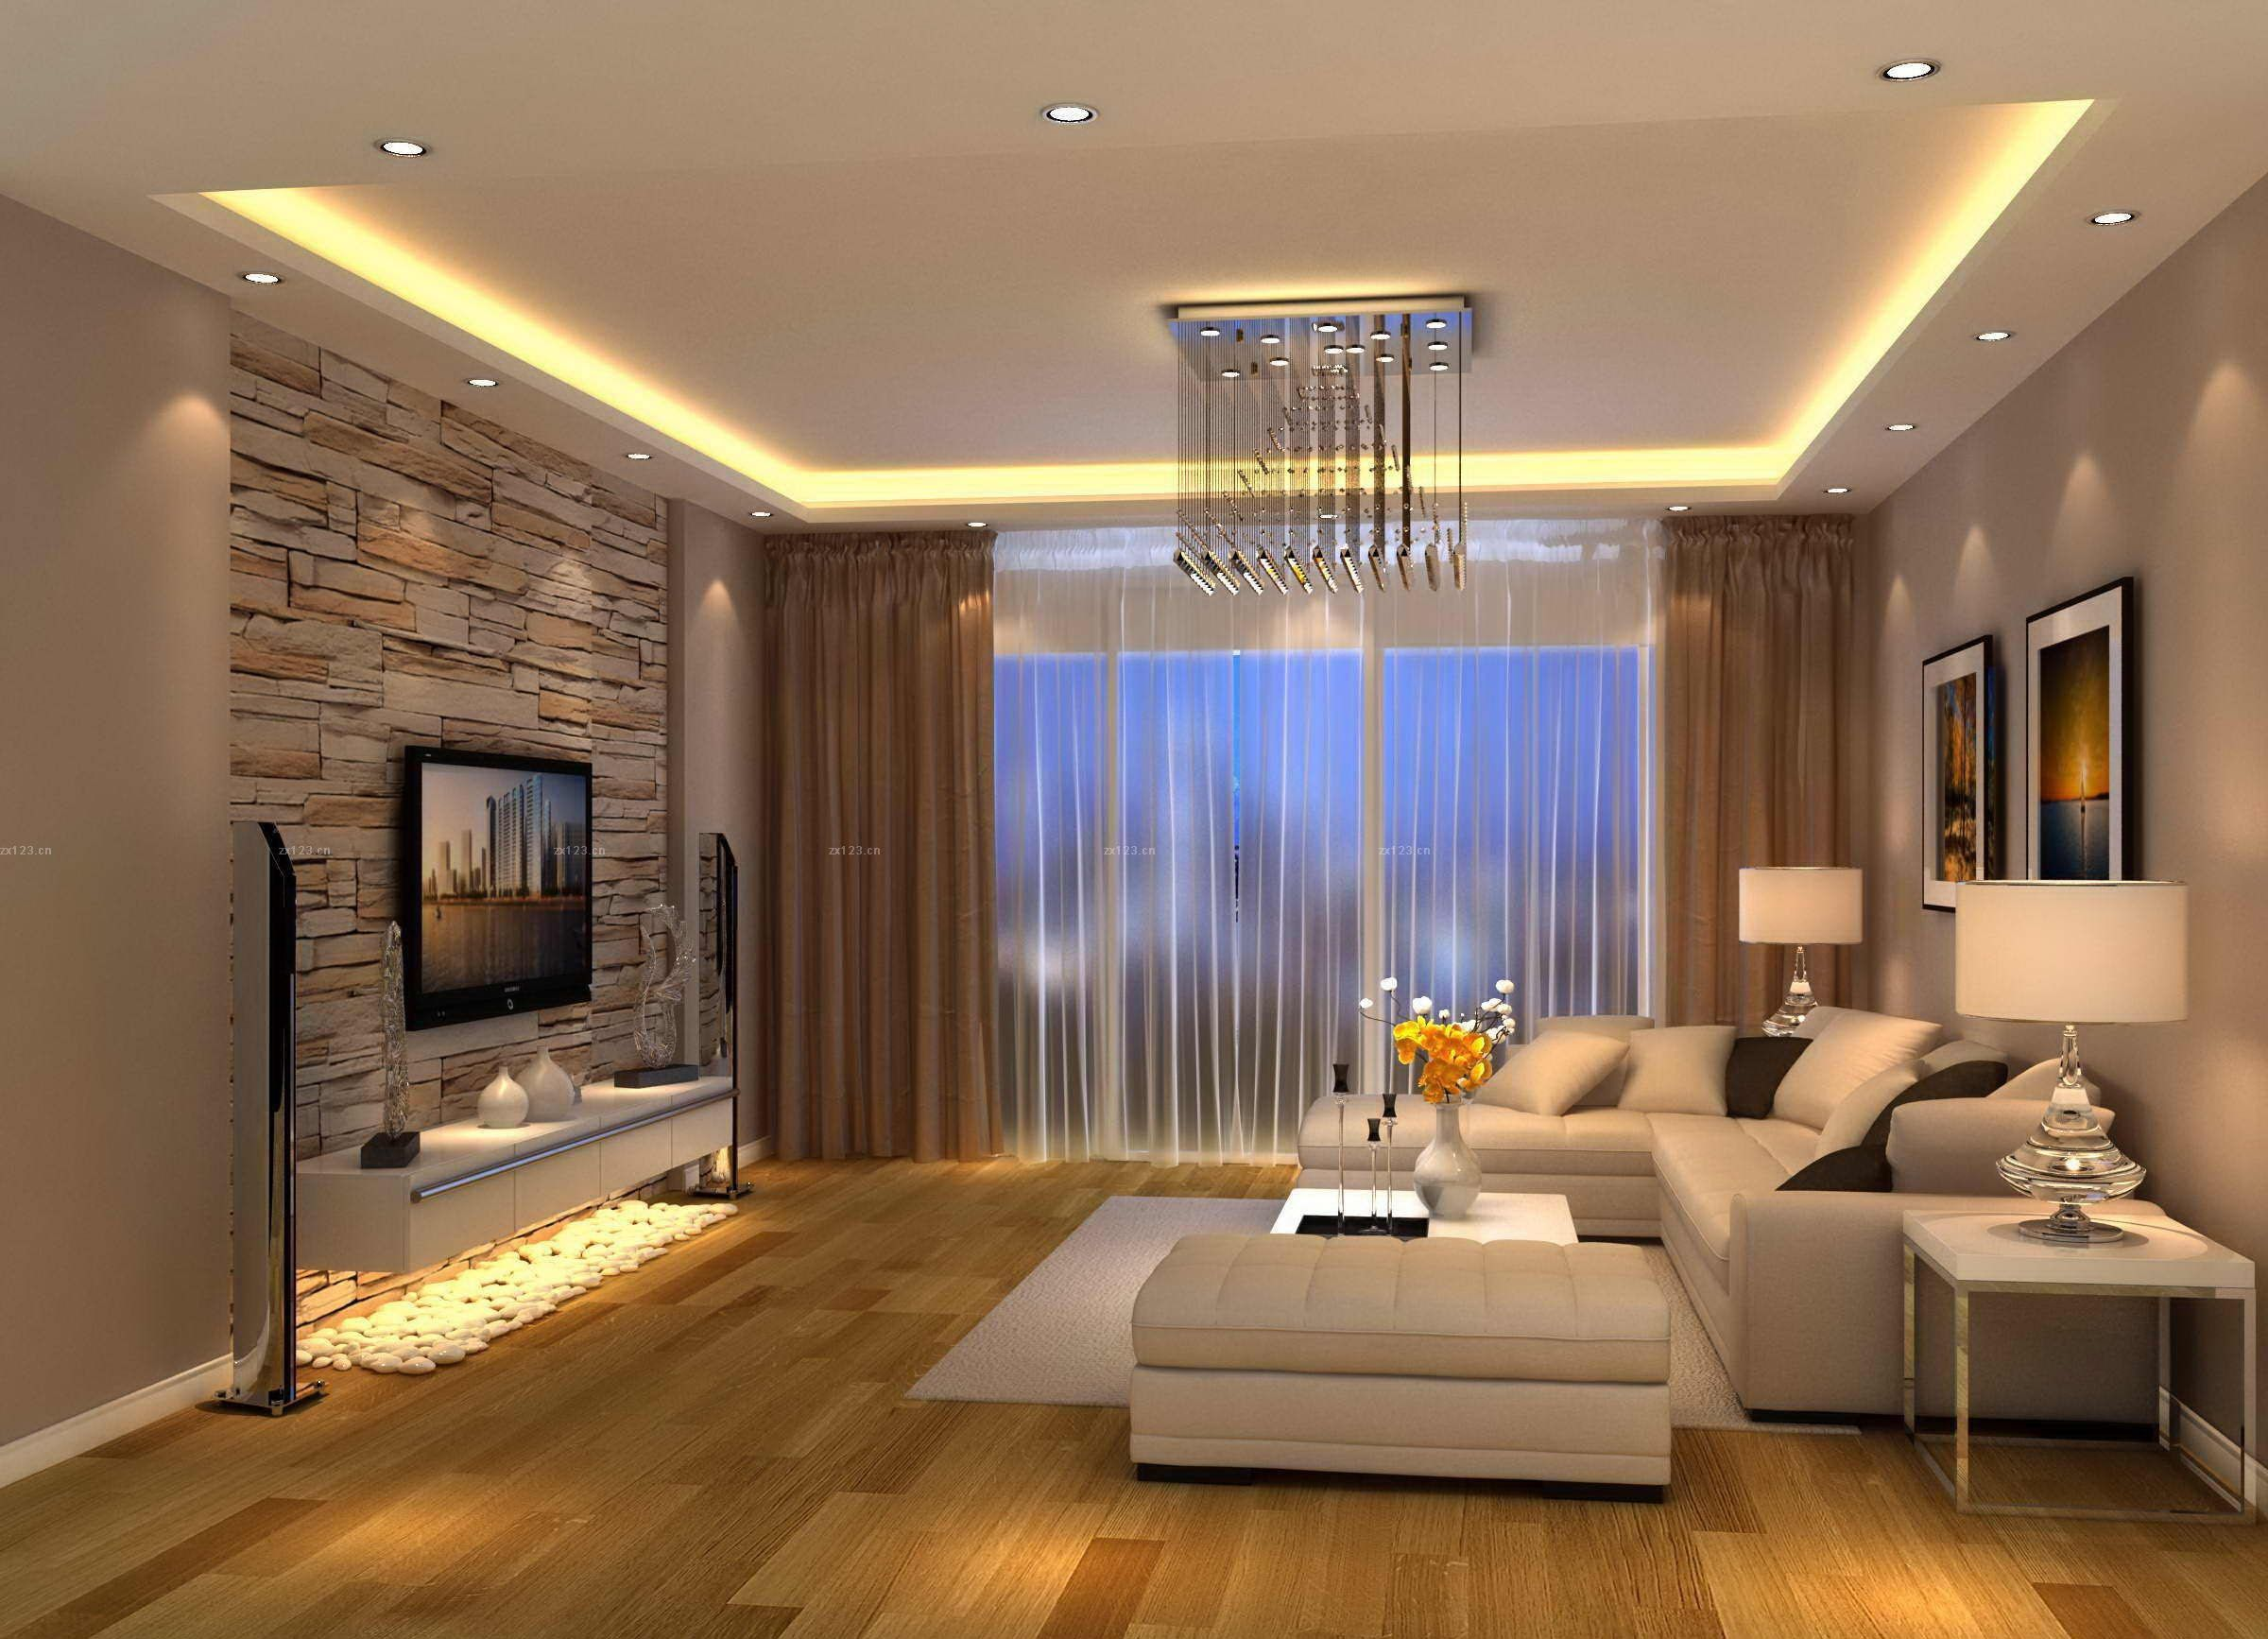 Best Kitchen Gallery: Modern Living Room Brown Design … Pinteres… of Living Room Ideas Modern  on rachelxblog.com